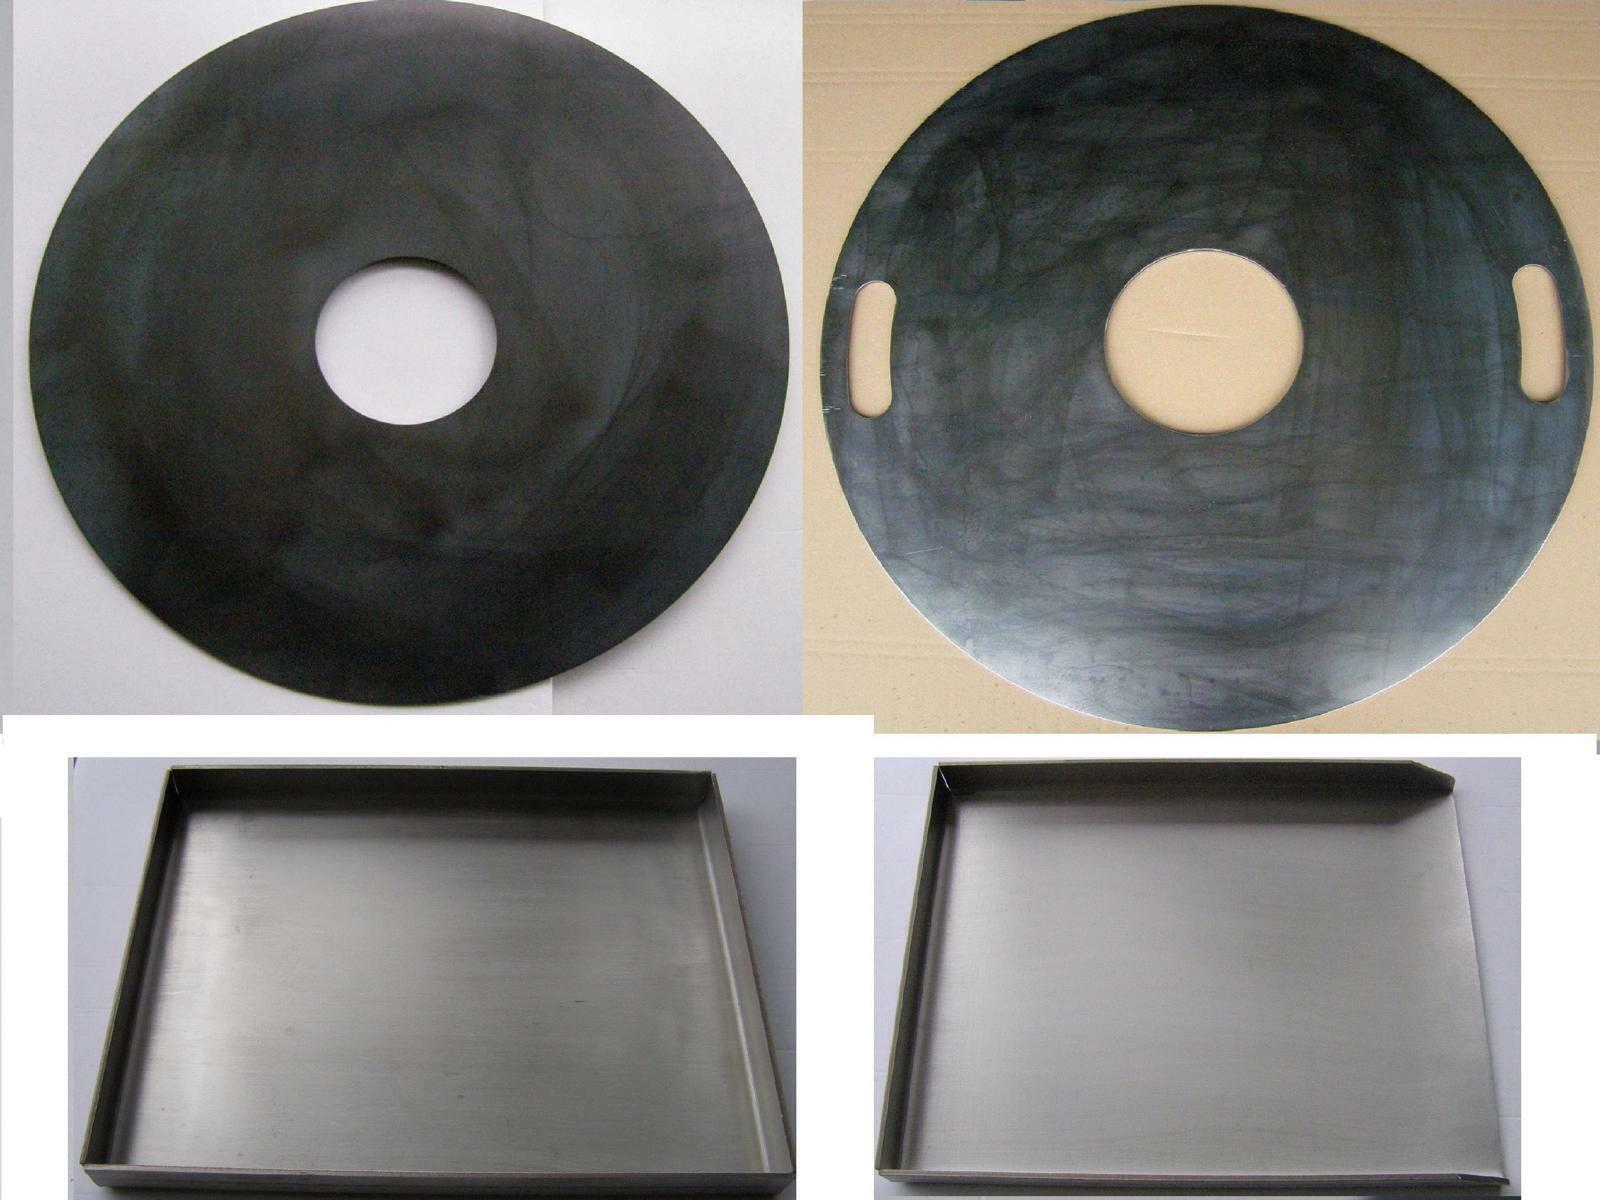 Feuerplatte 5 mm Tonne Feuerschale Stahl Plancha / Grillplatte fü Kugel Grill